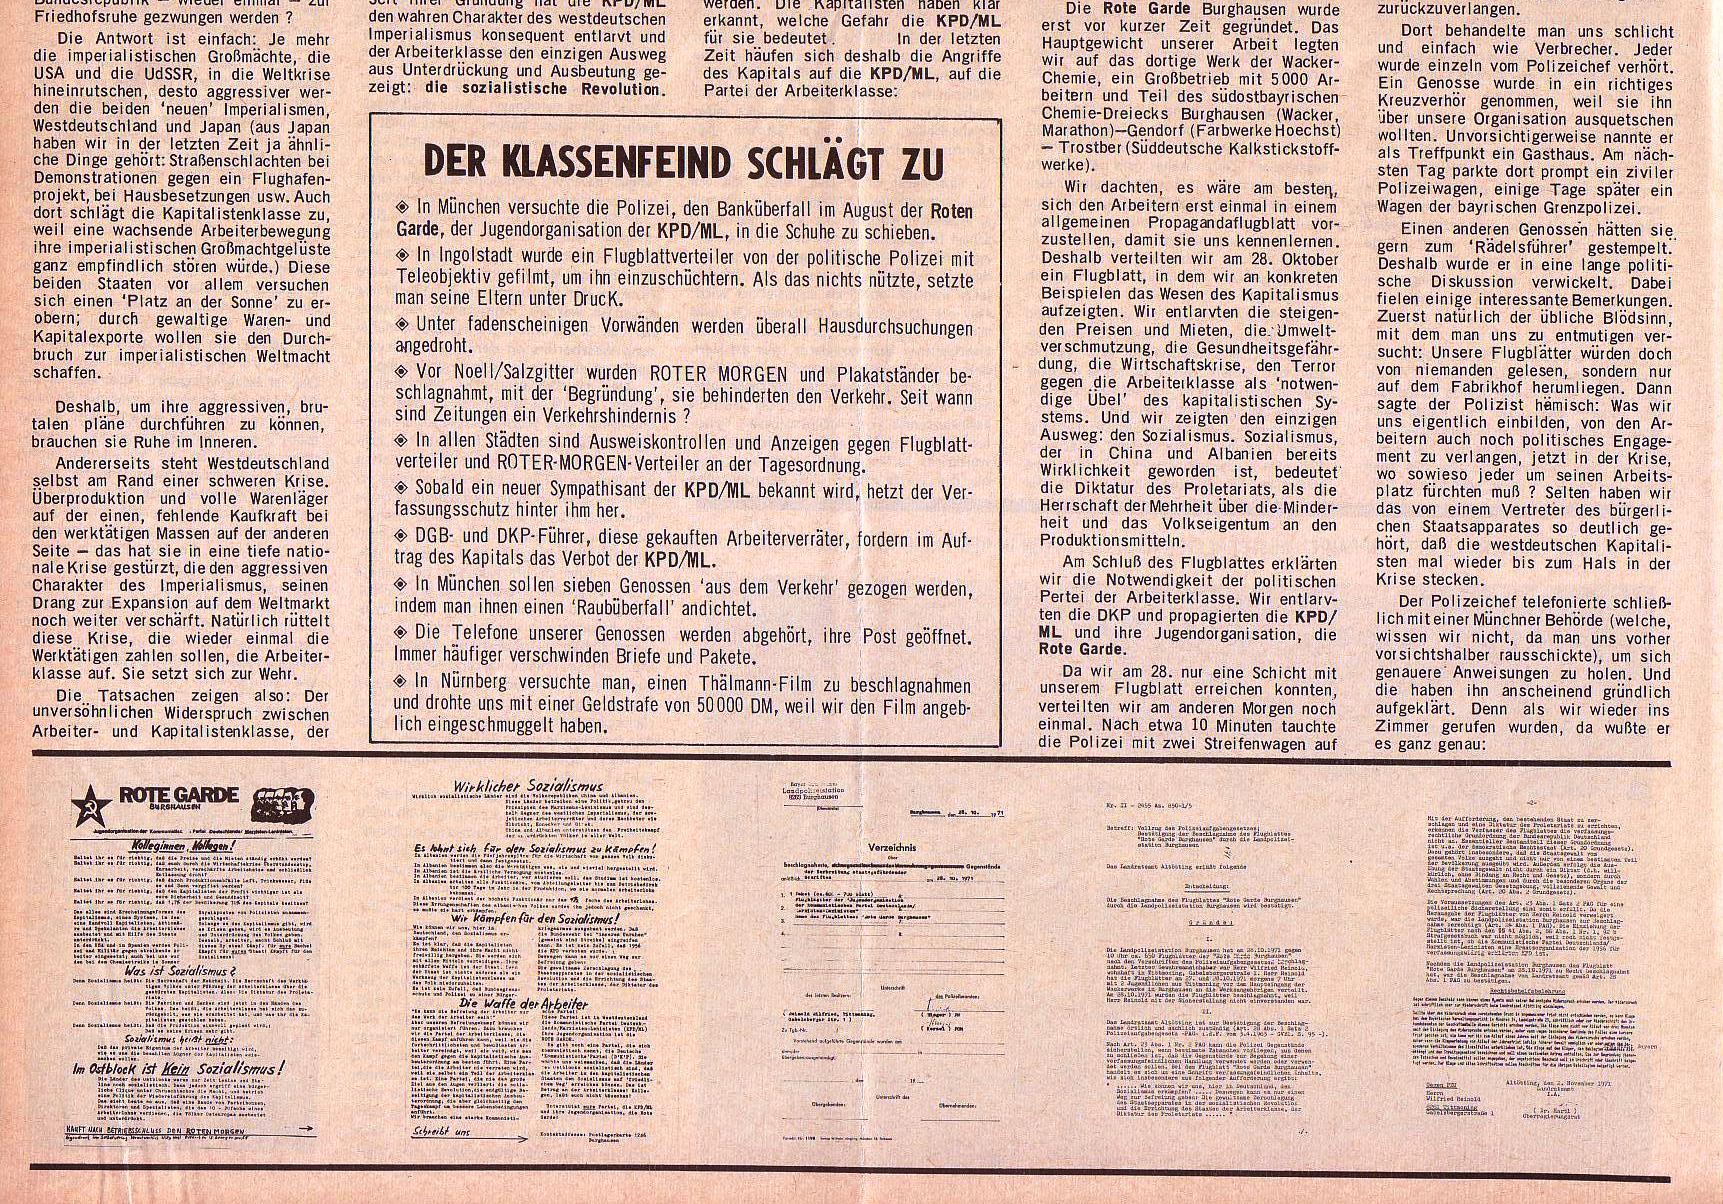 Roter Morgen, 5. Jg., 22. November 1971, Nr. 14, Seite 6b